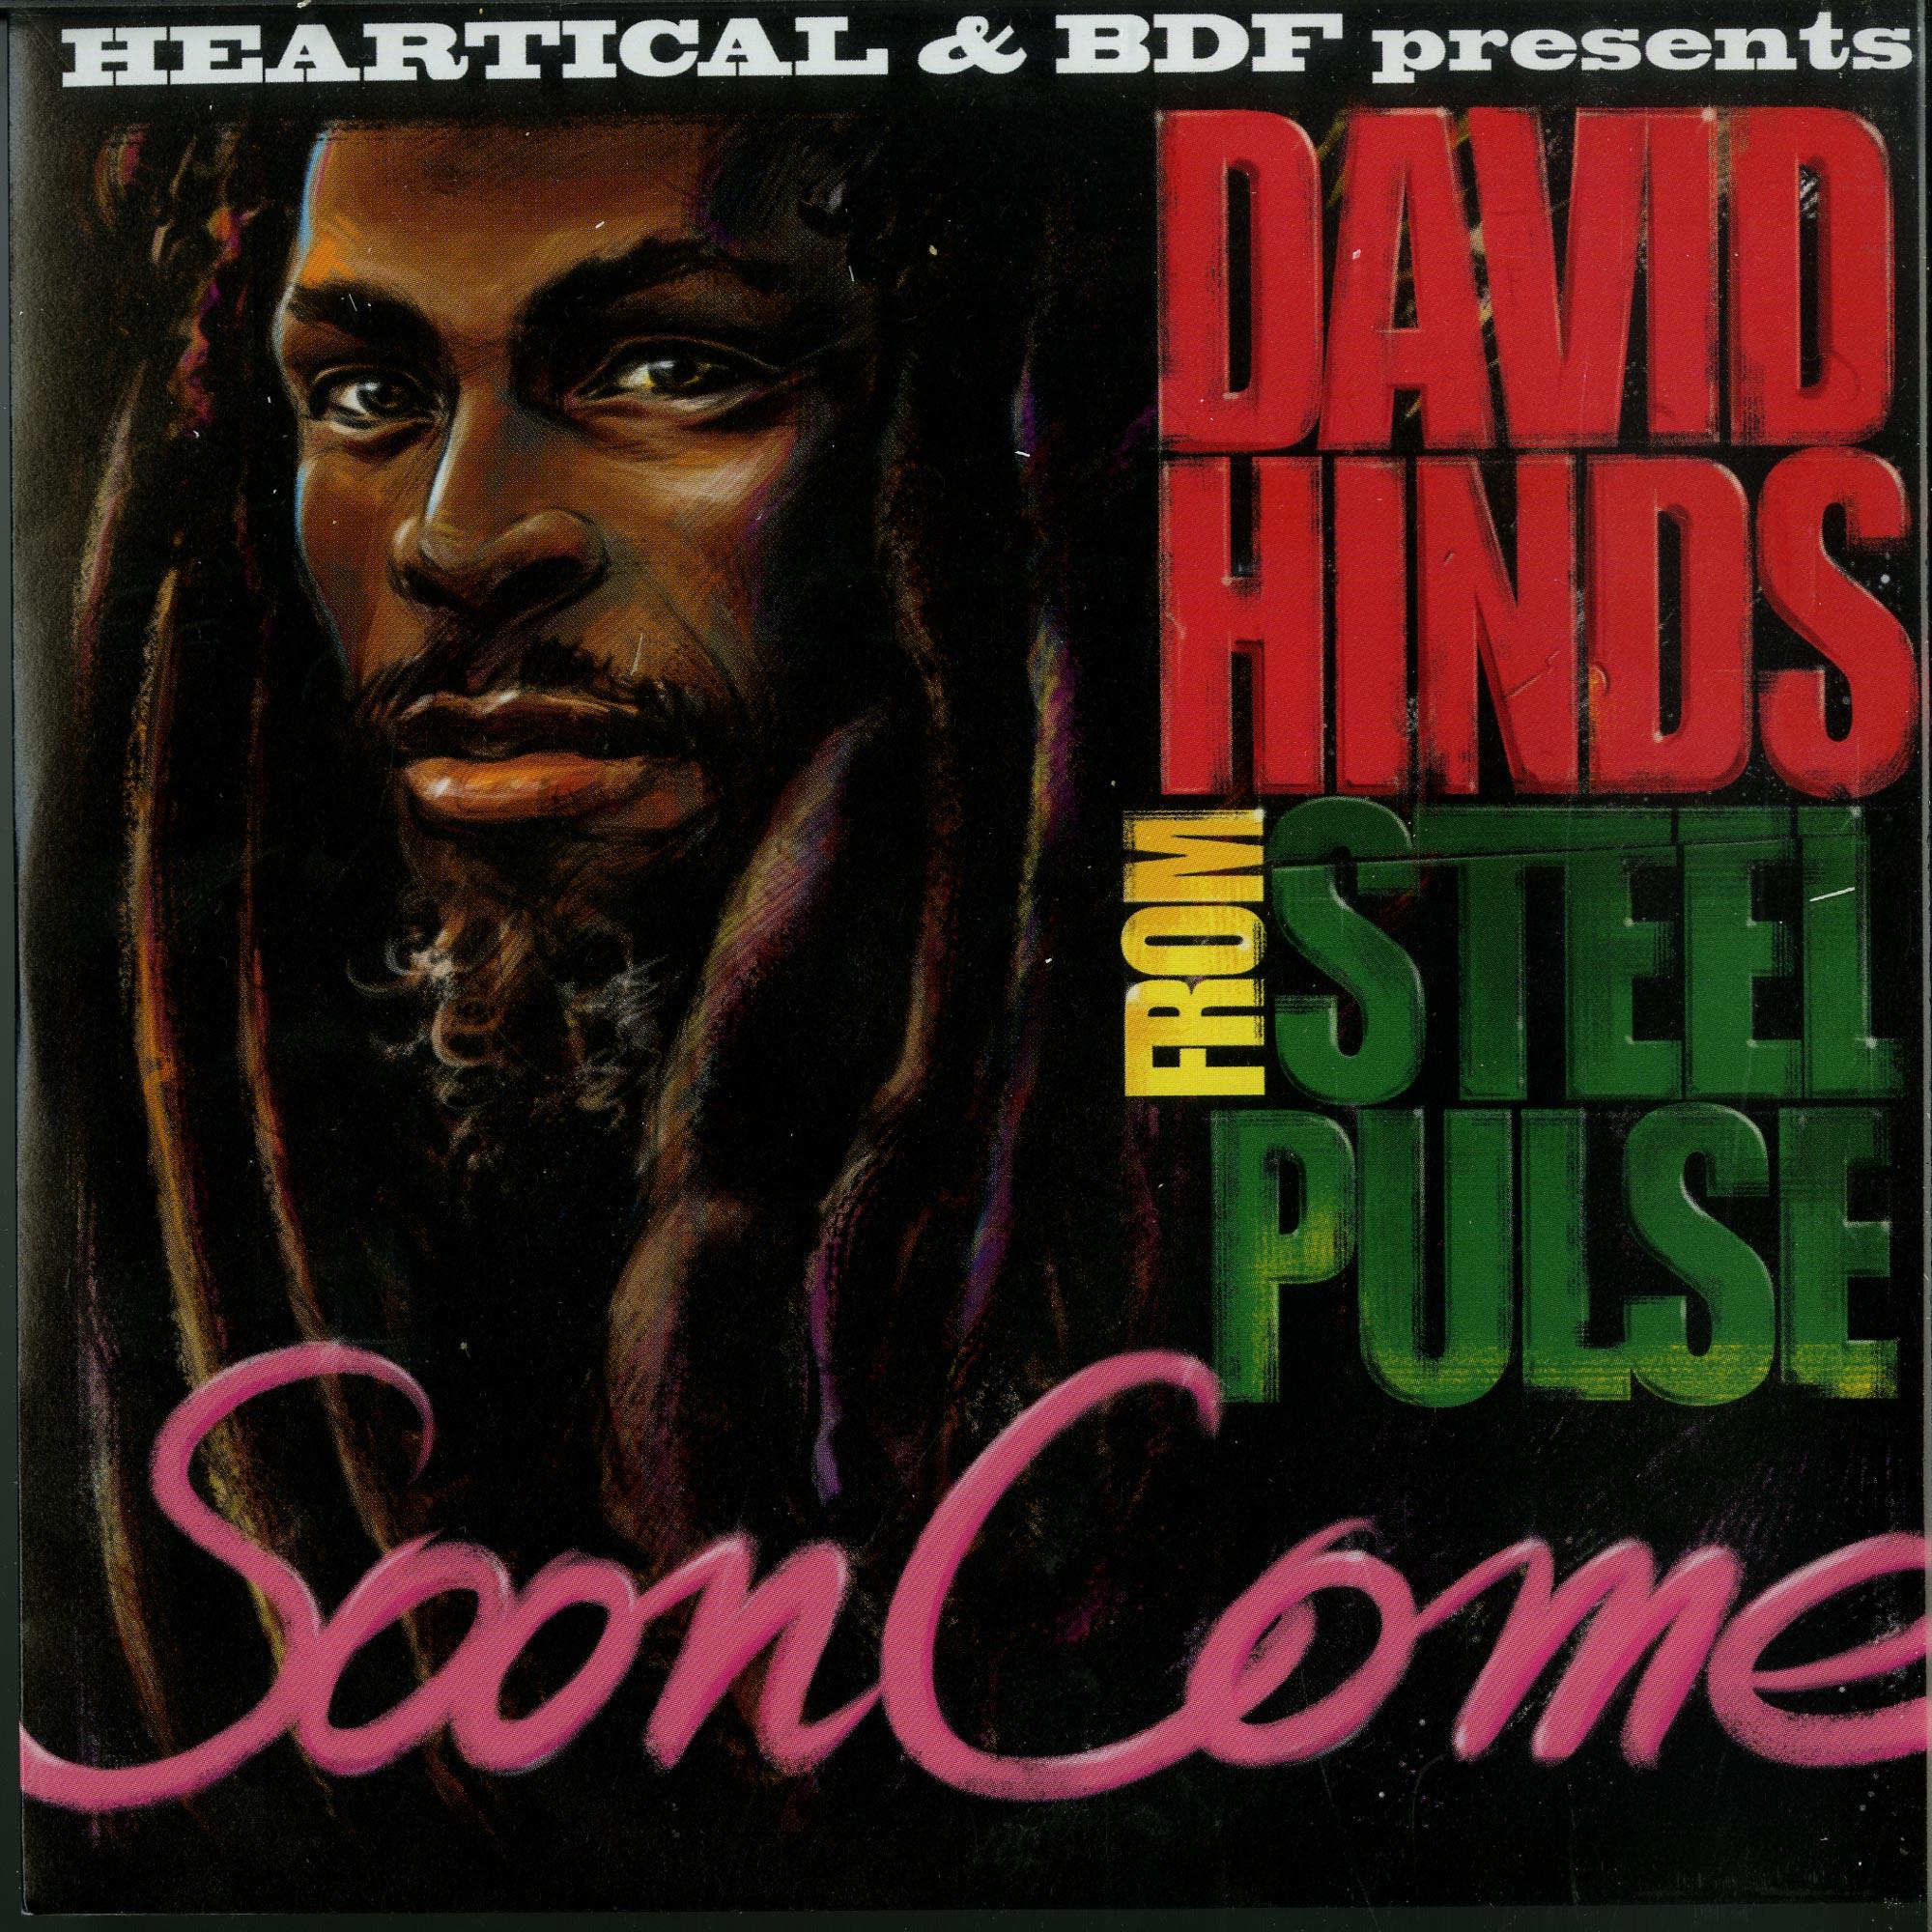 David Hinds / Dr. Reason & Mr. Heart - SOON COME / GUIVE & LIV HIGH